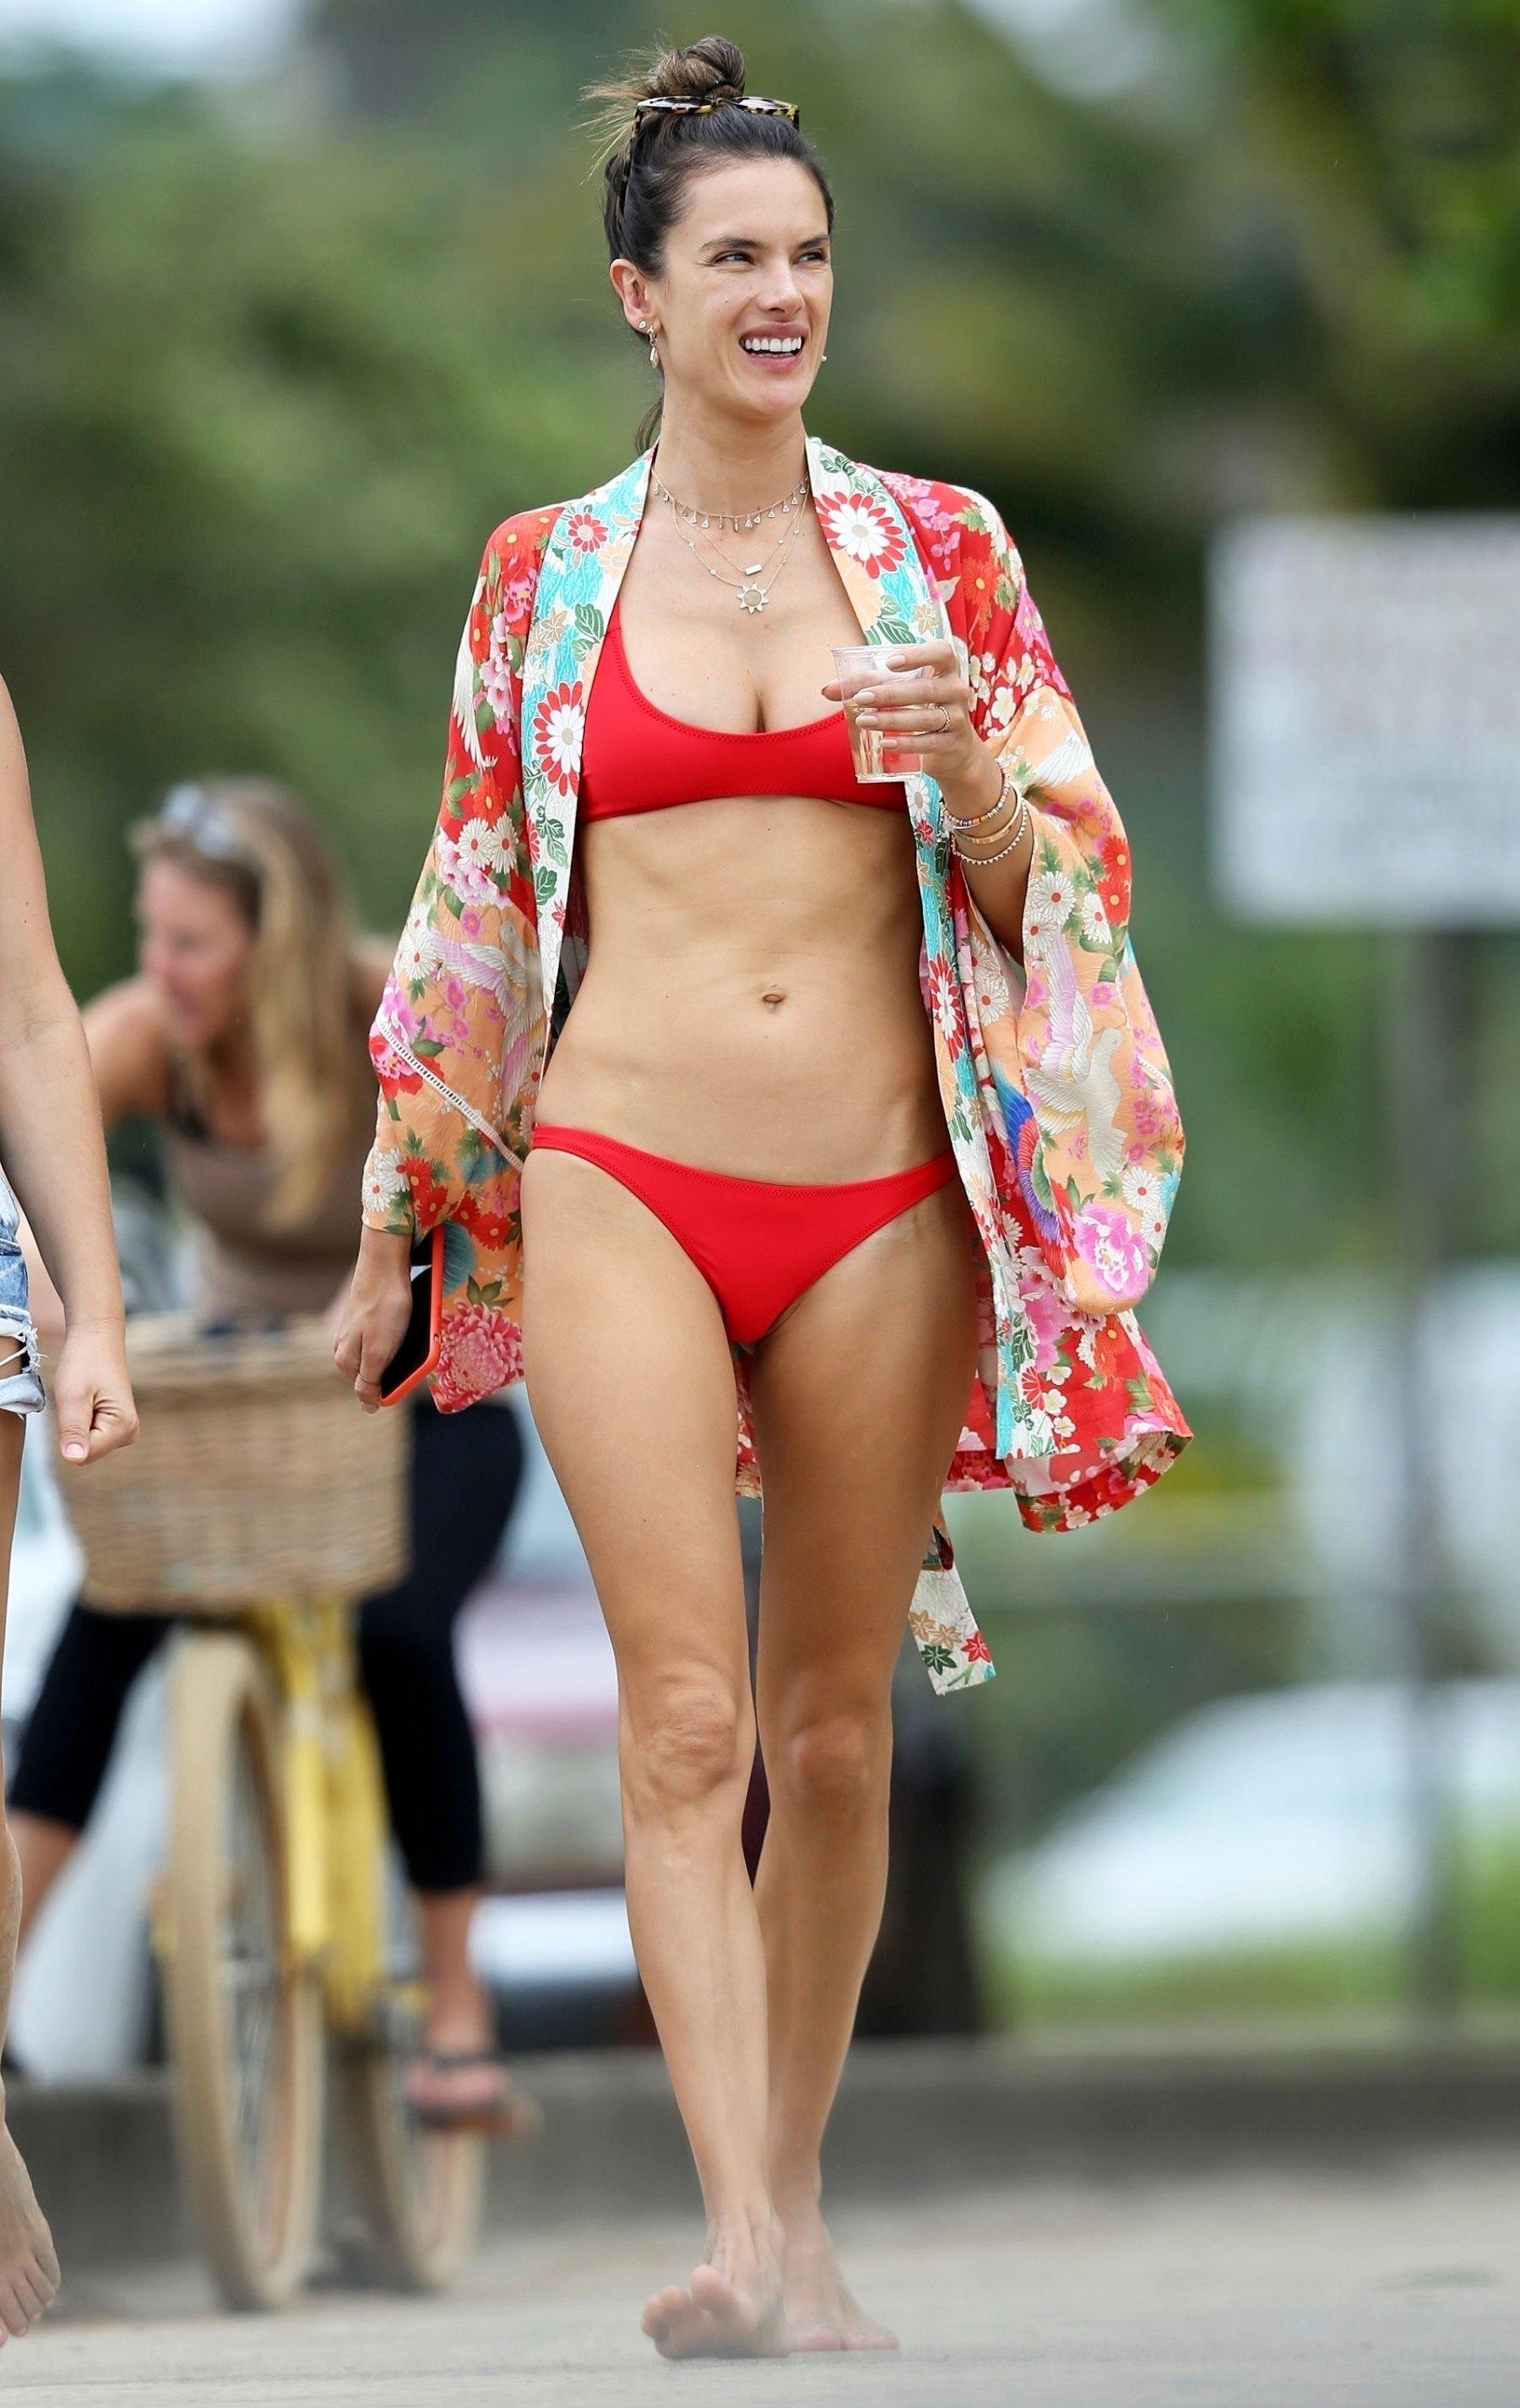 Alessandra Ambrosio mặc bikini hai mảnh màu đỏ và áo kimono